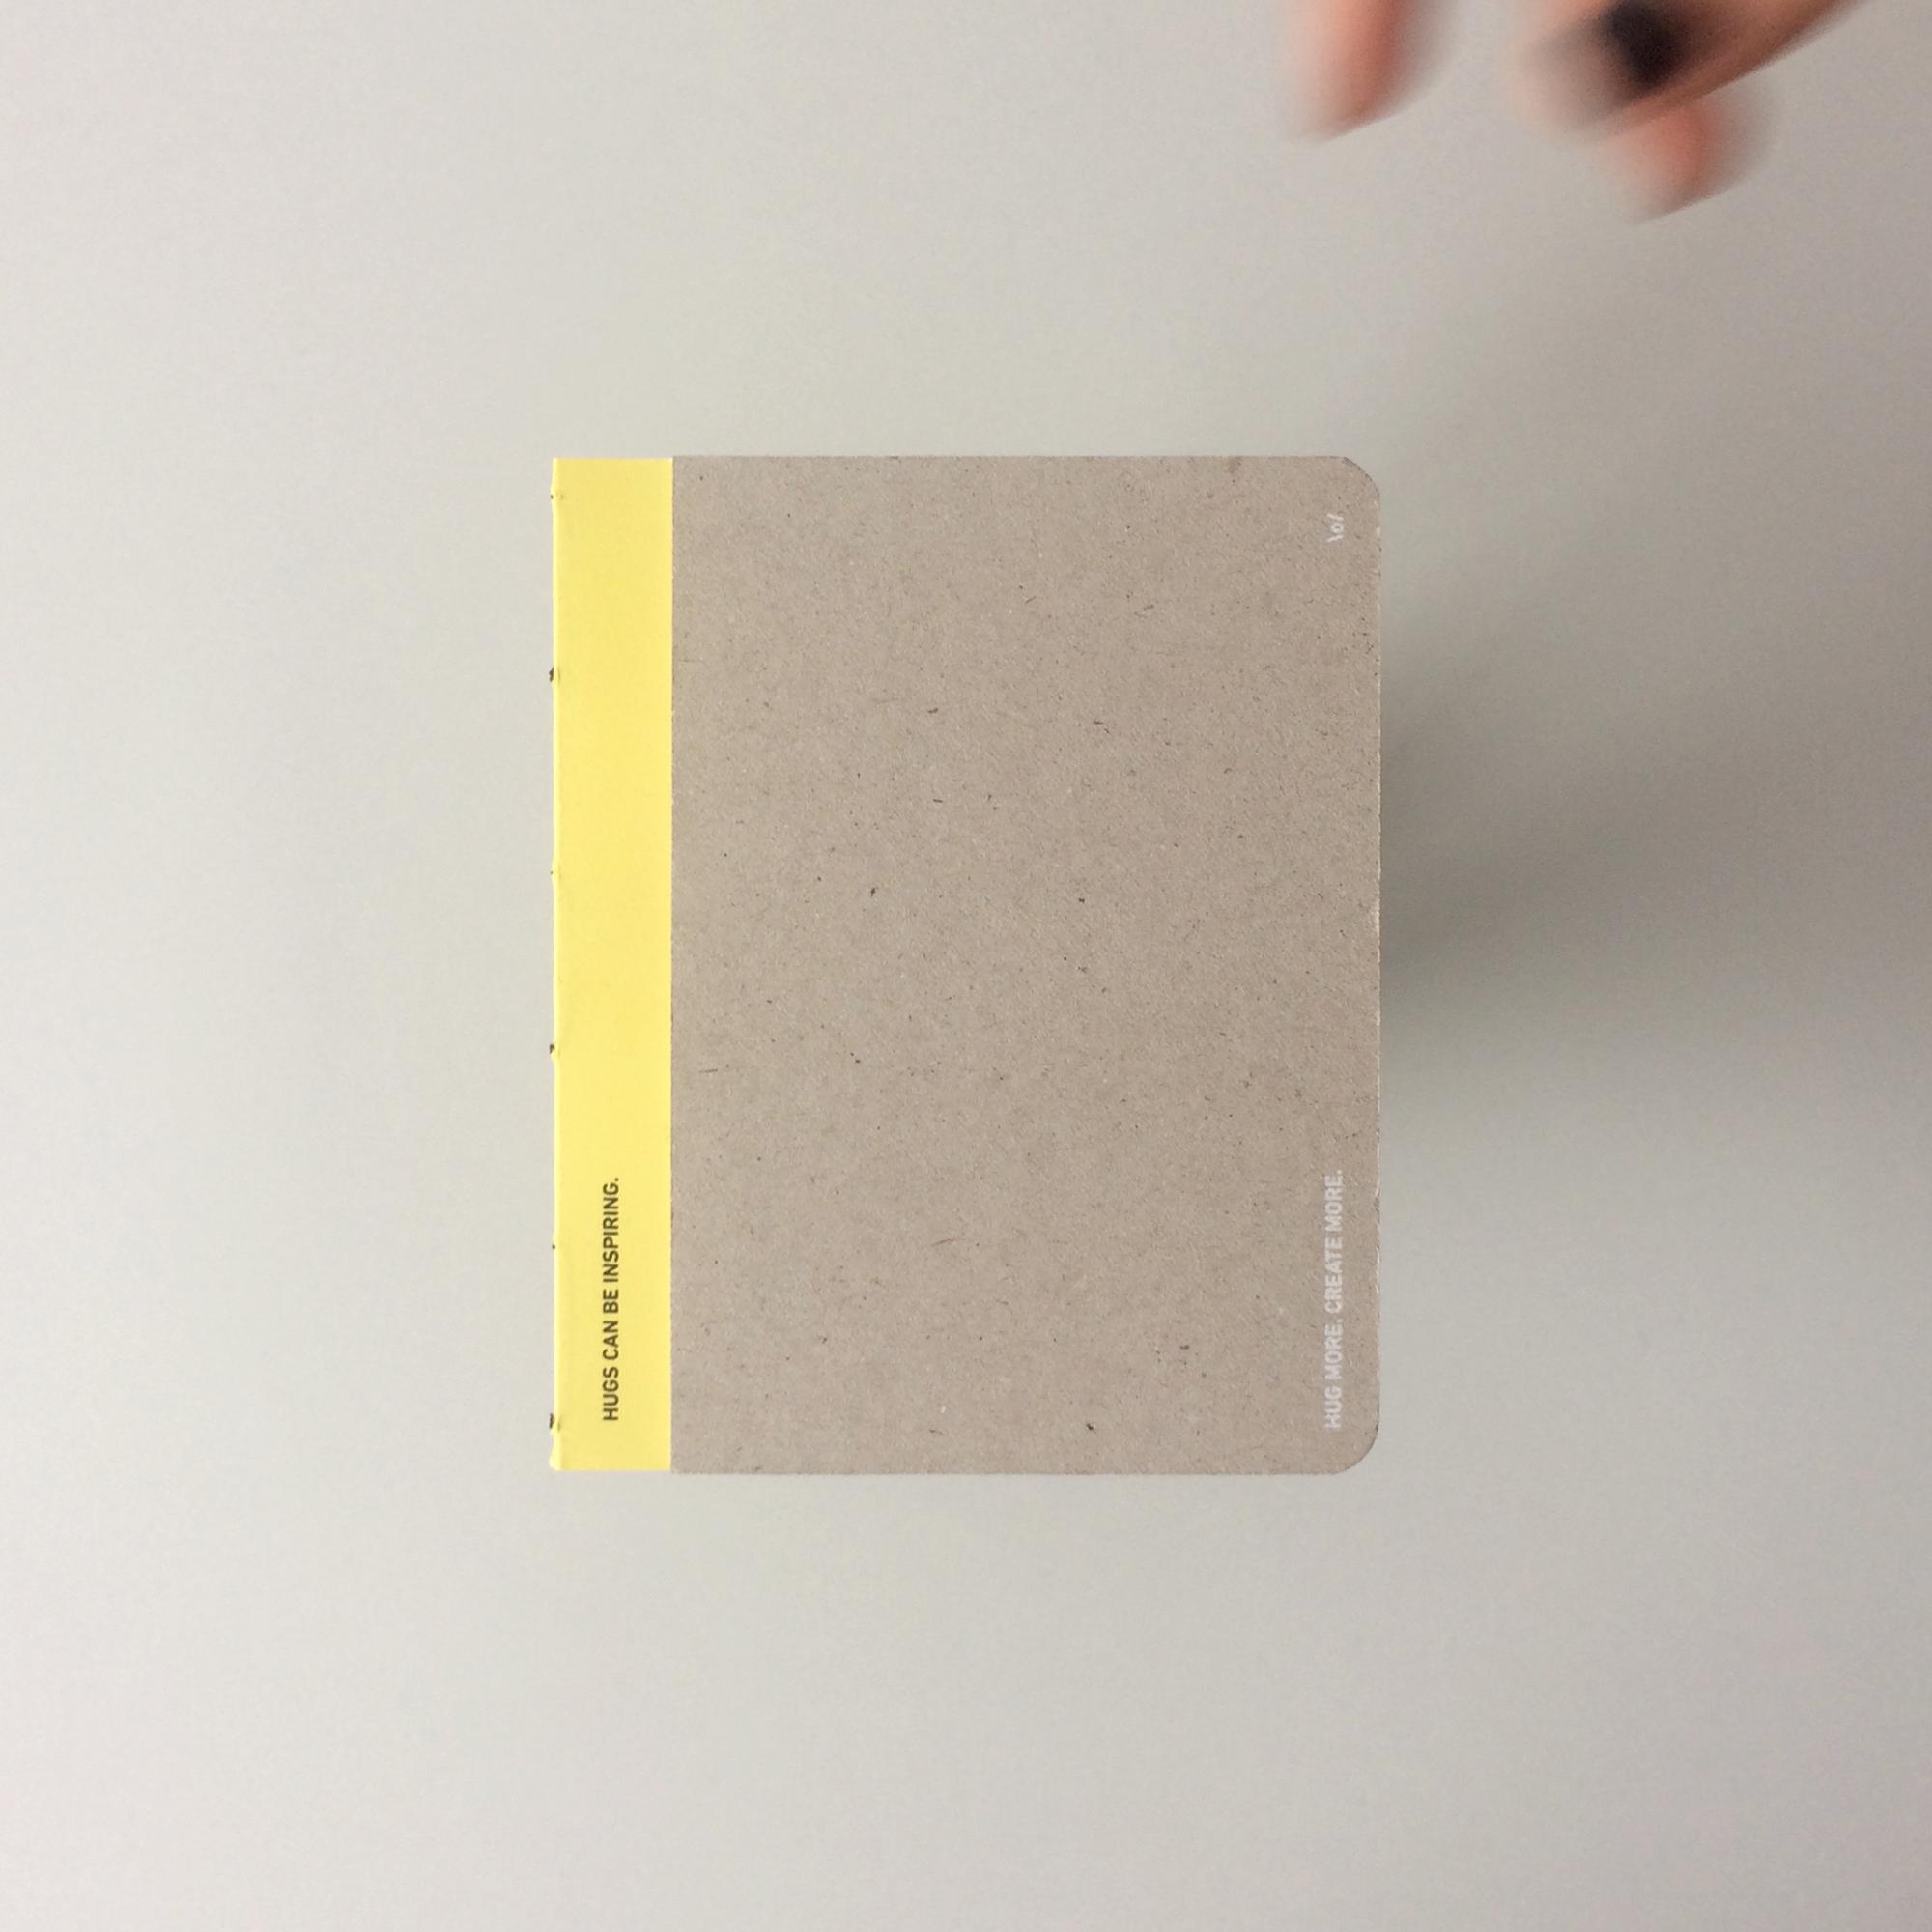 hug_more_sketchbook-sunny-002.jpg